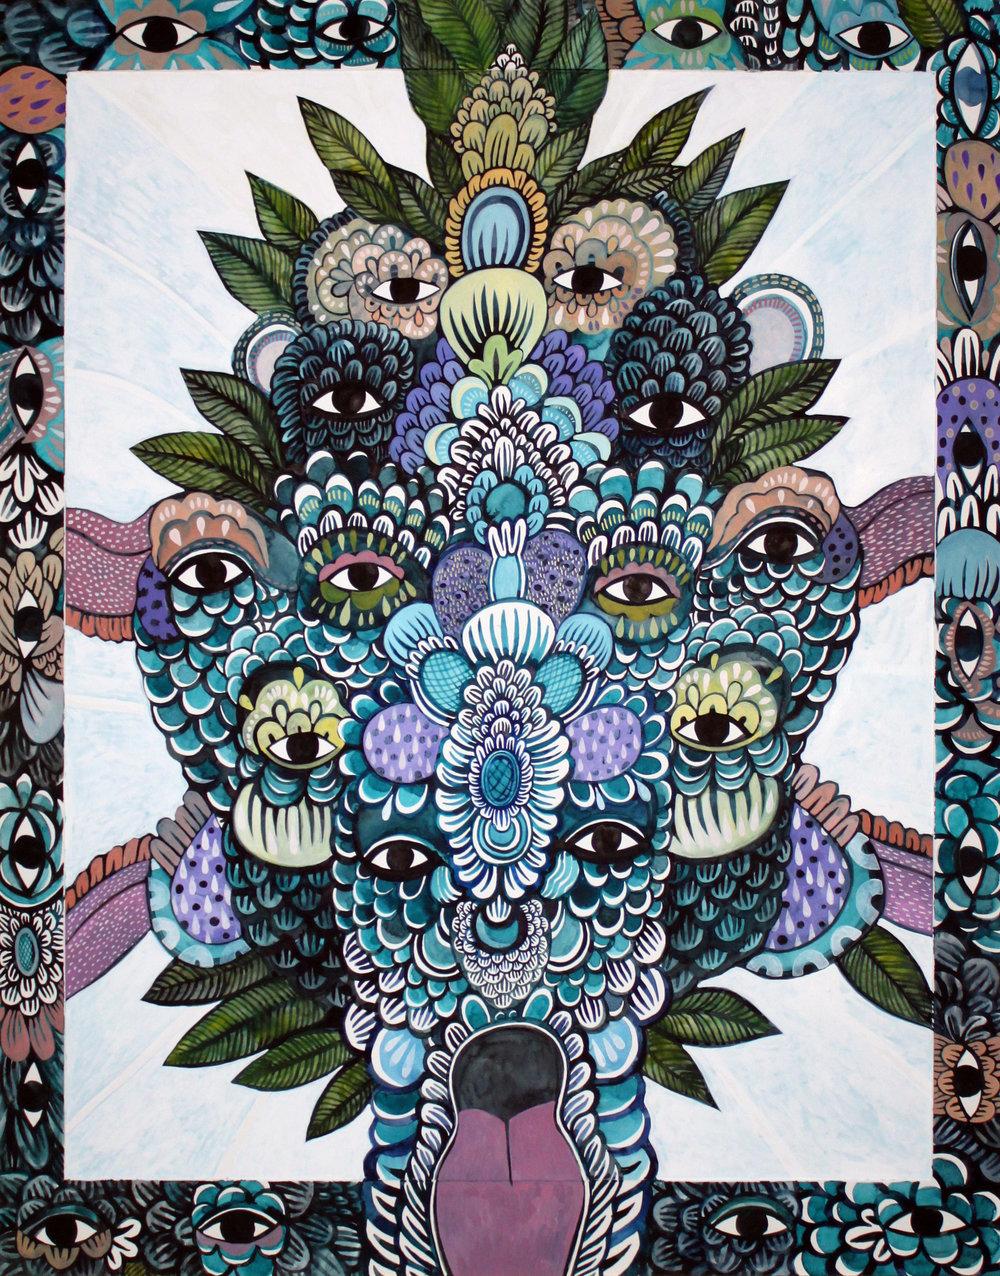 CECILIA FOGELBERG  Mayhem Cluster #1 , 2019 gouache and watercolour on 100% cotton rag board, framed 87 x 68 cm